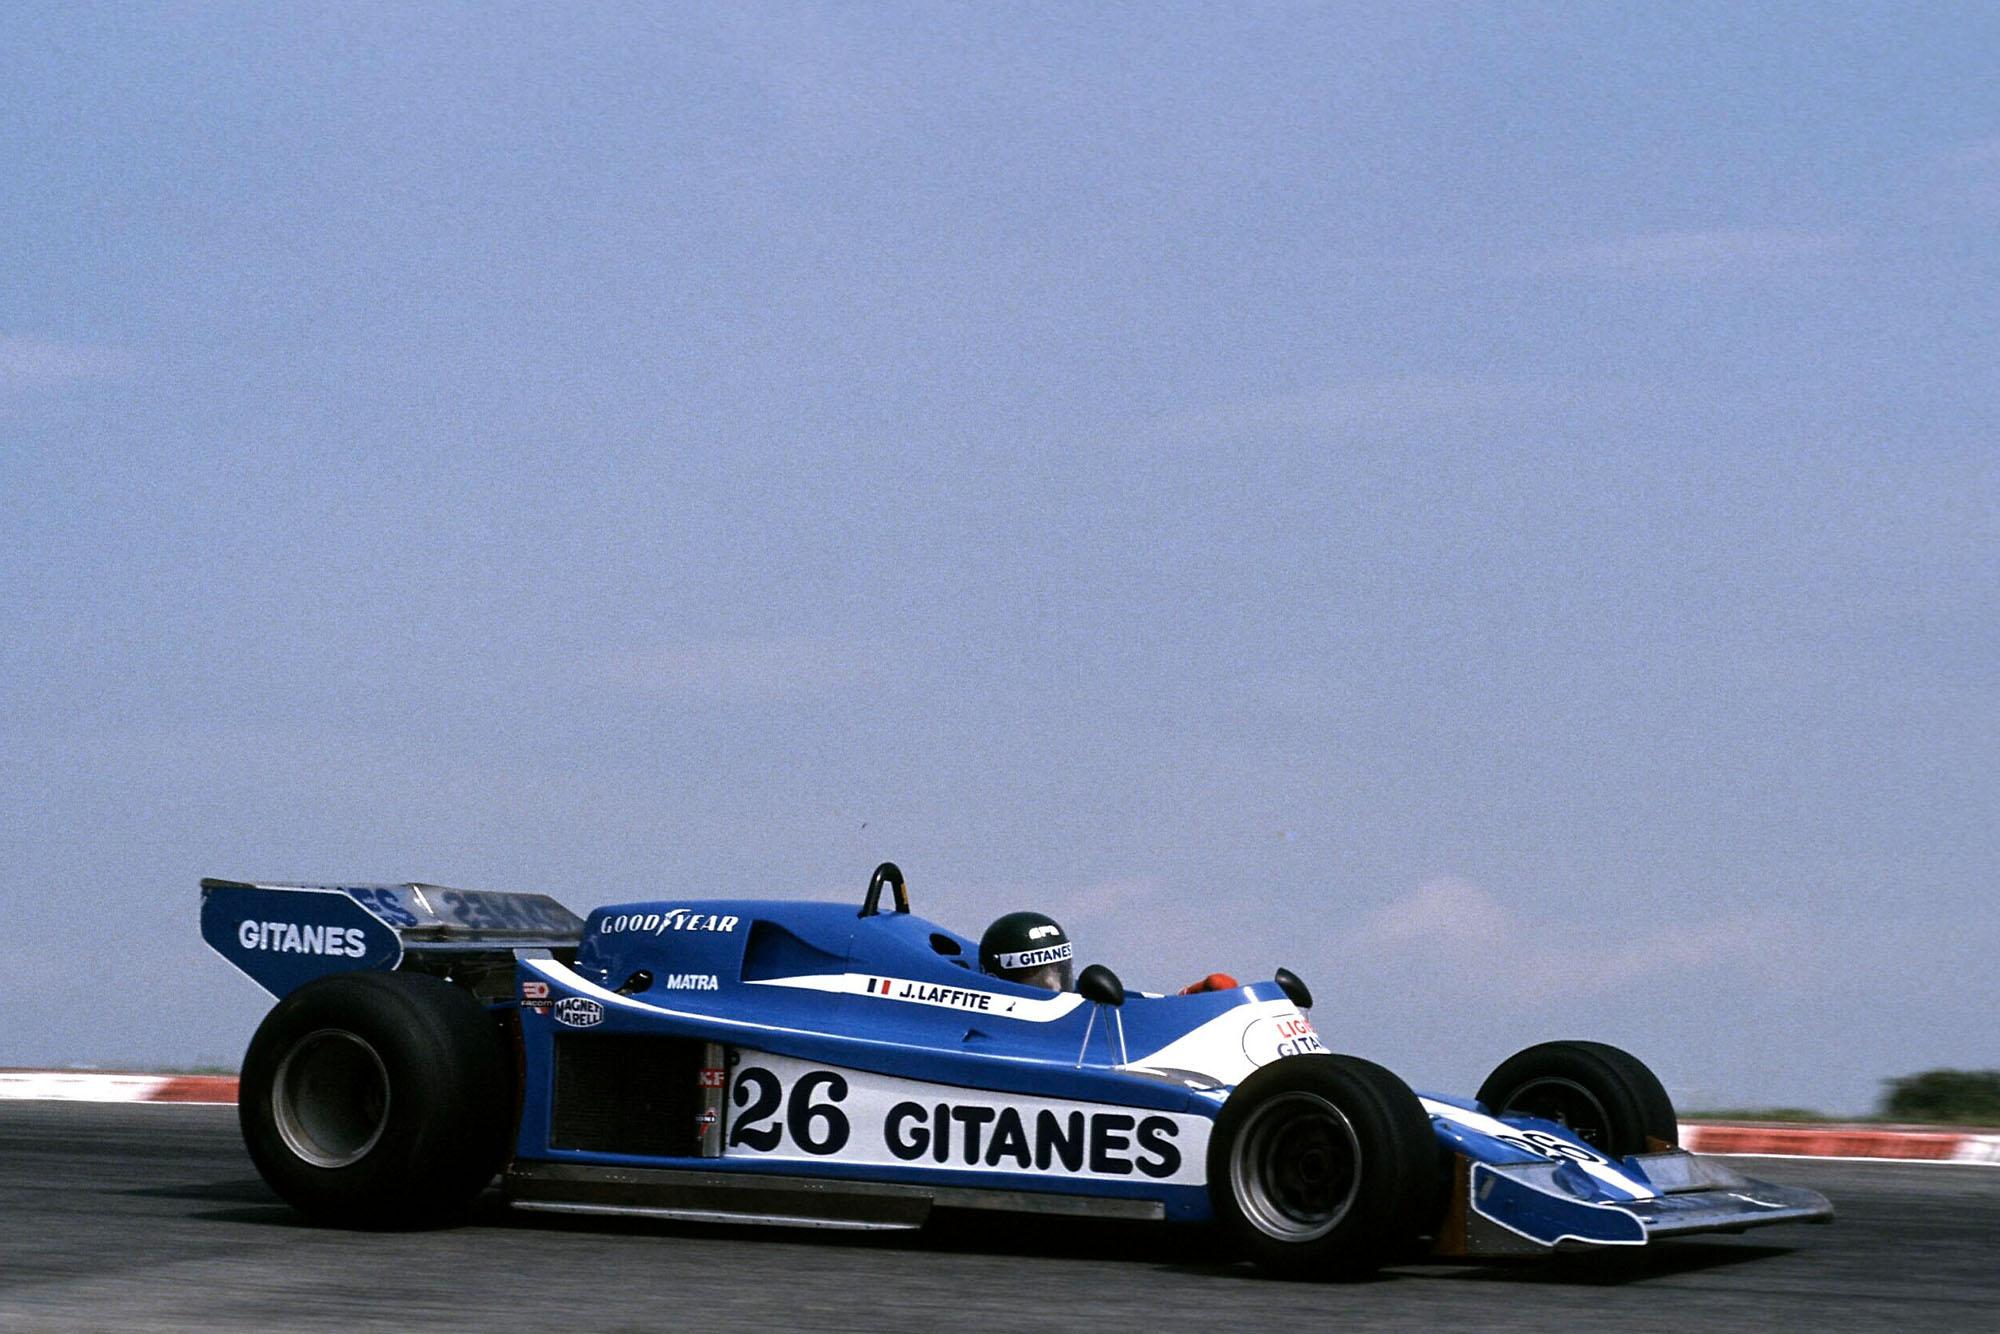 Jacques Laffite (Ligier) racing at the 1978 Spanish Grand Prix, Jarama.